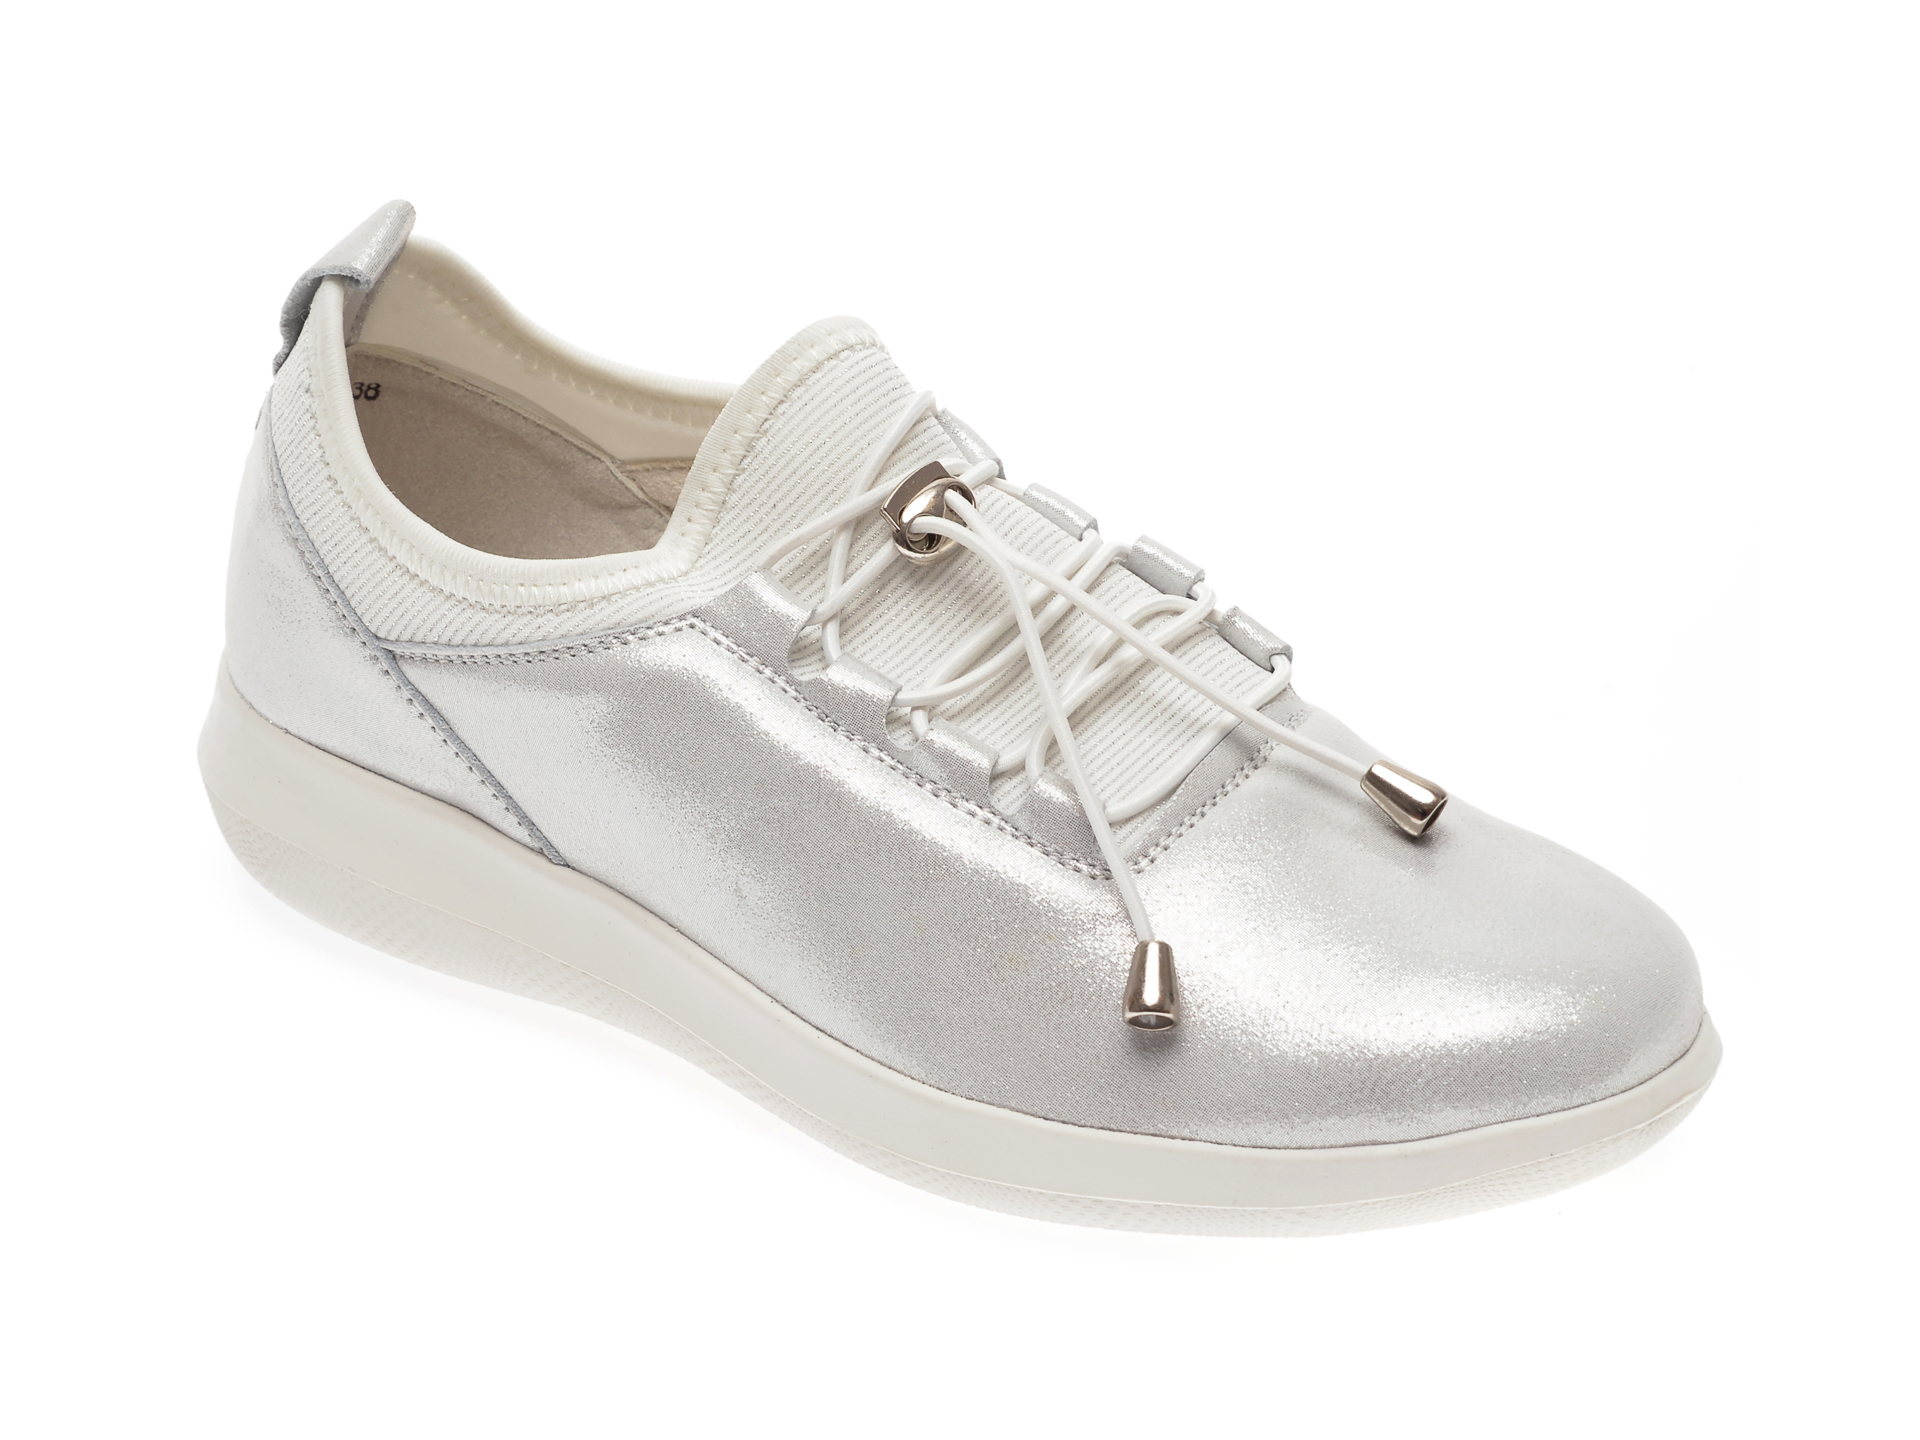 Pantofi IMAGE albi, 8595312, din piele naturala